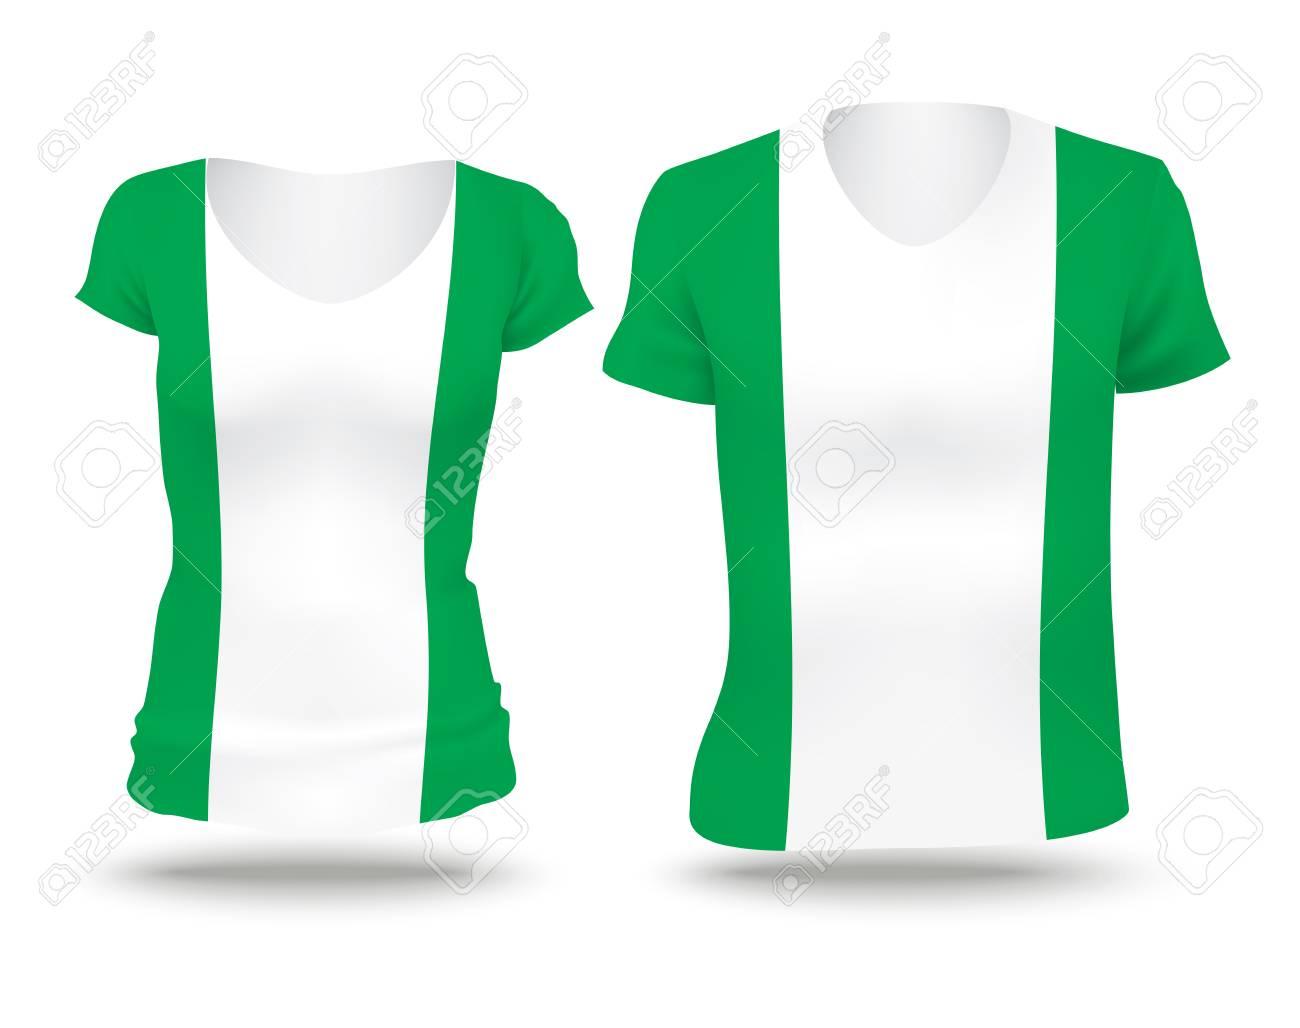 Shirt design in nigeria - Flag Shirt Design Of Nigeria Vector Illustration Stock Vector 42297887